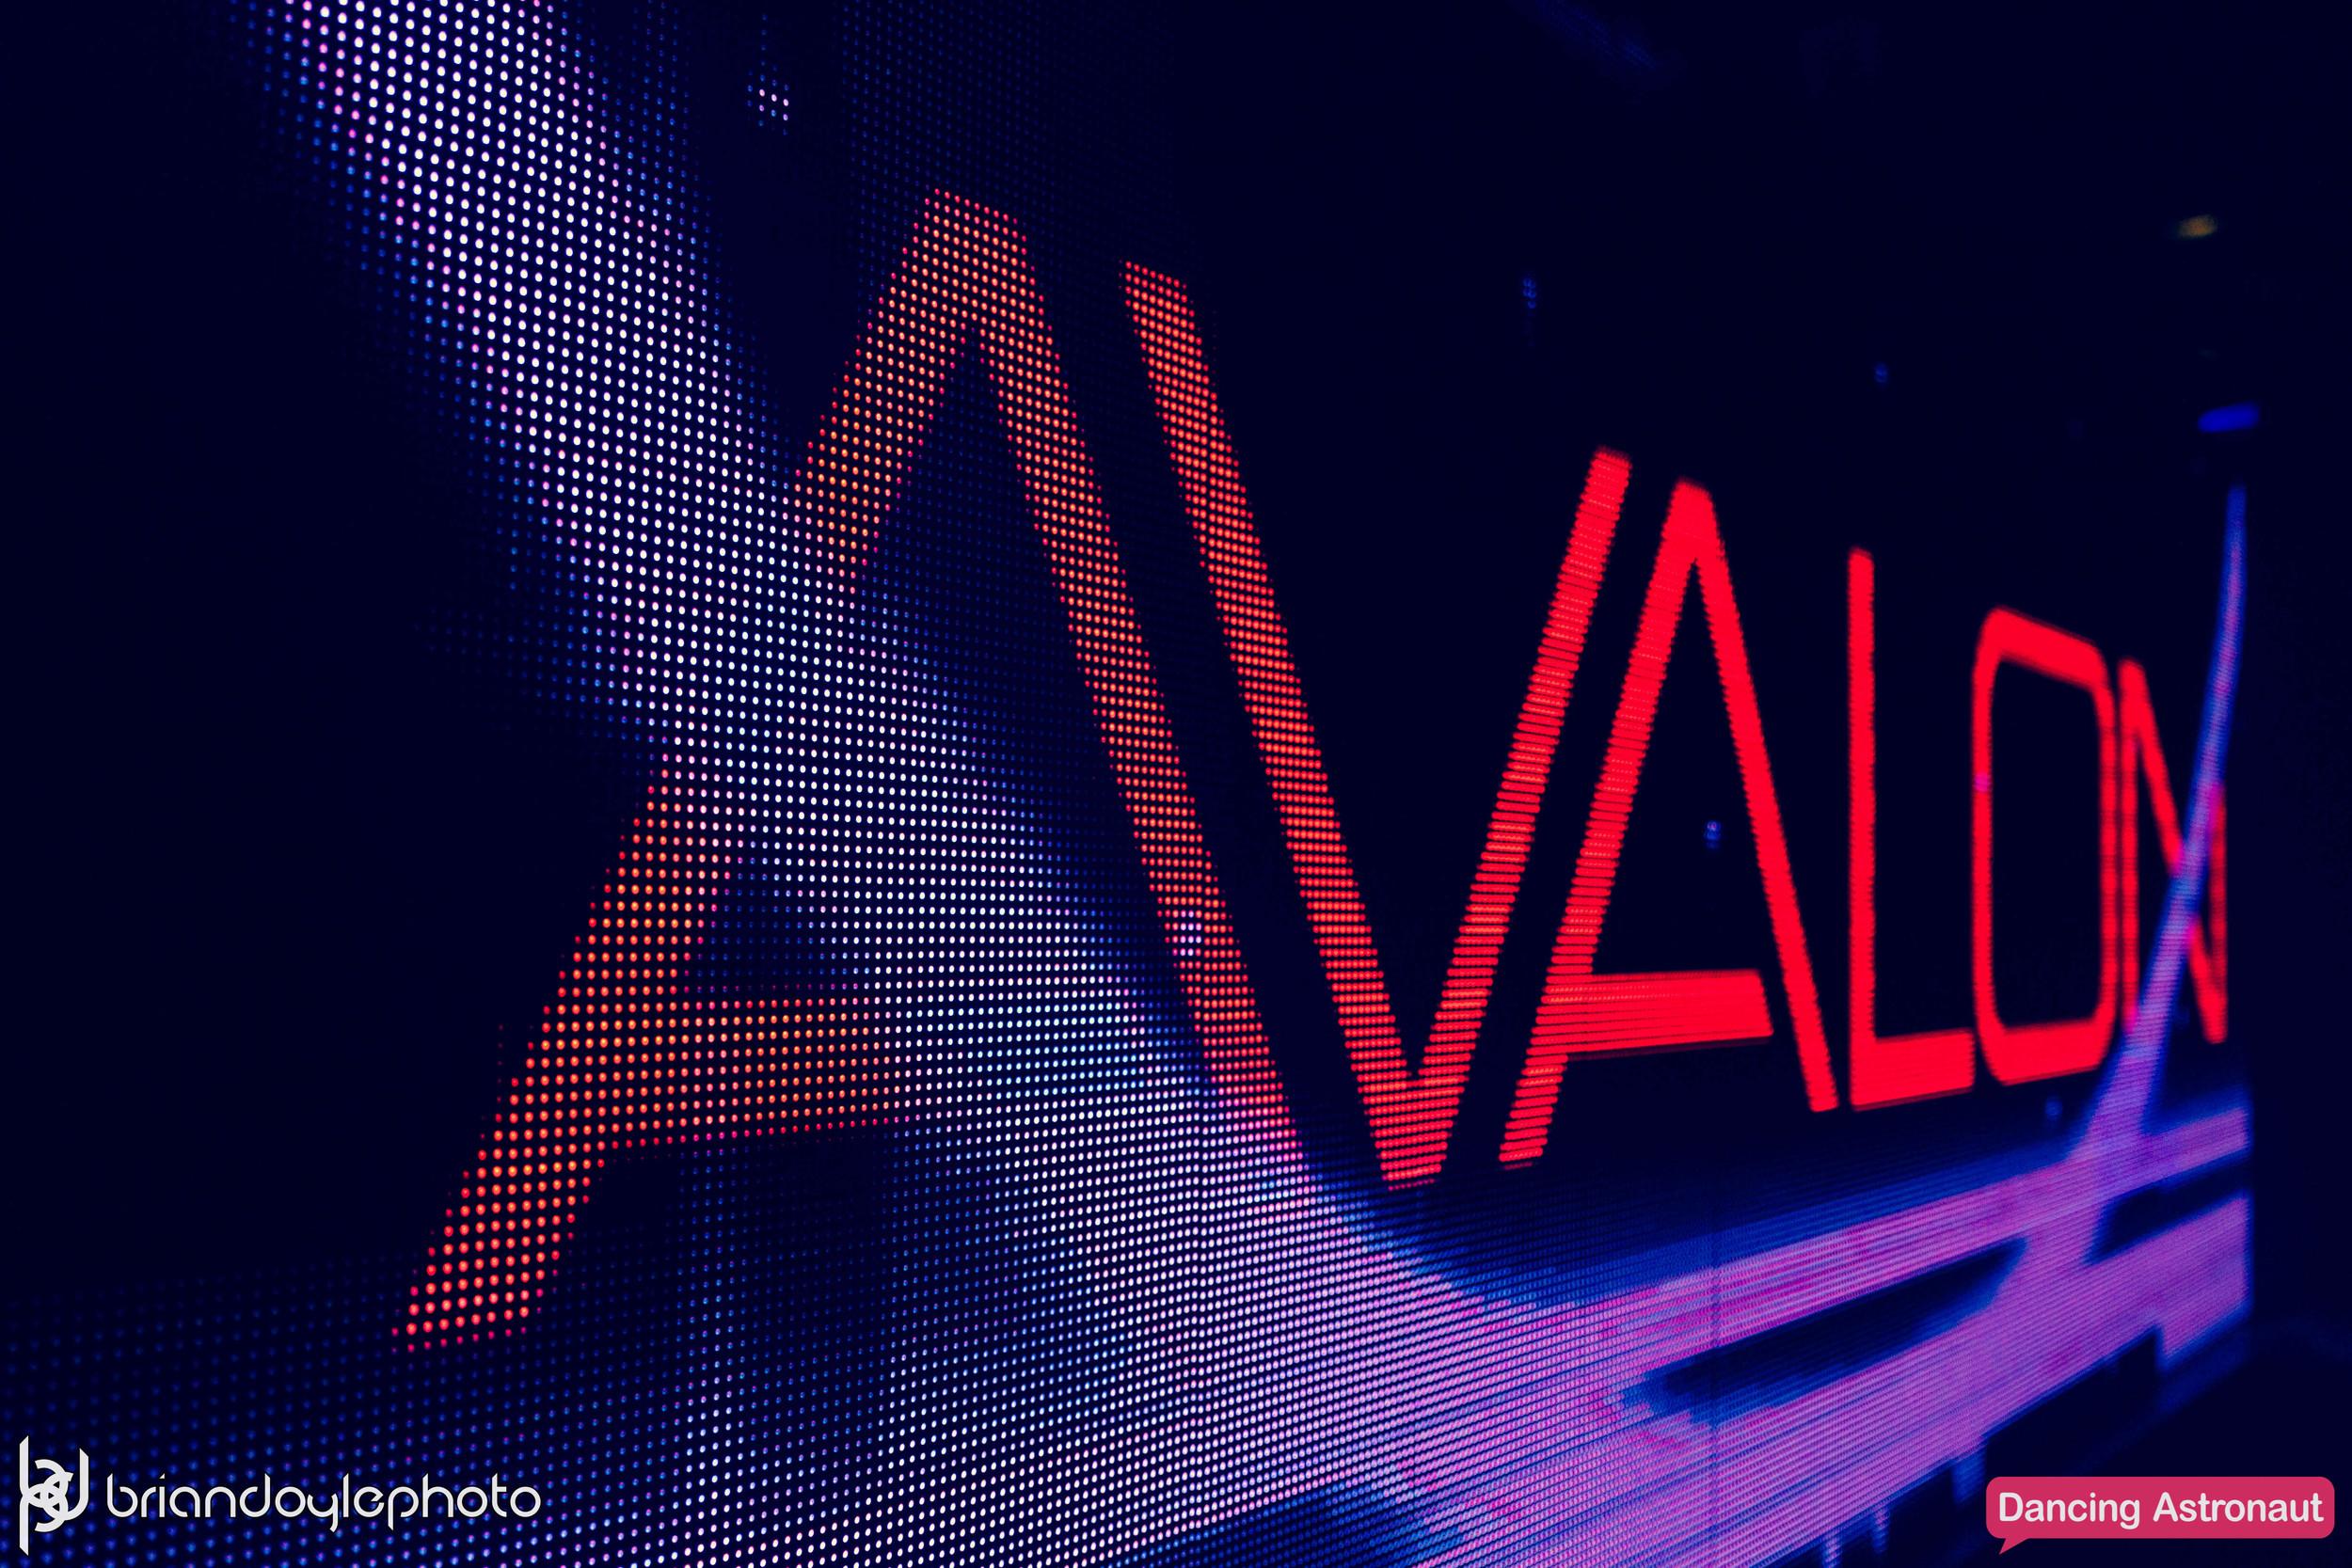 Max Vangeli @ Avalon bdp 25.10.2014-2.jpg